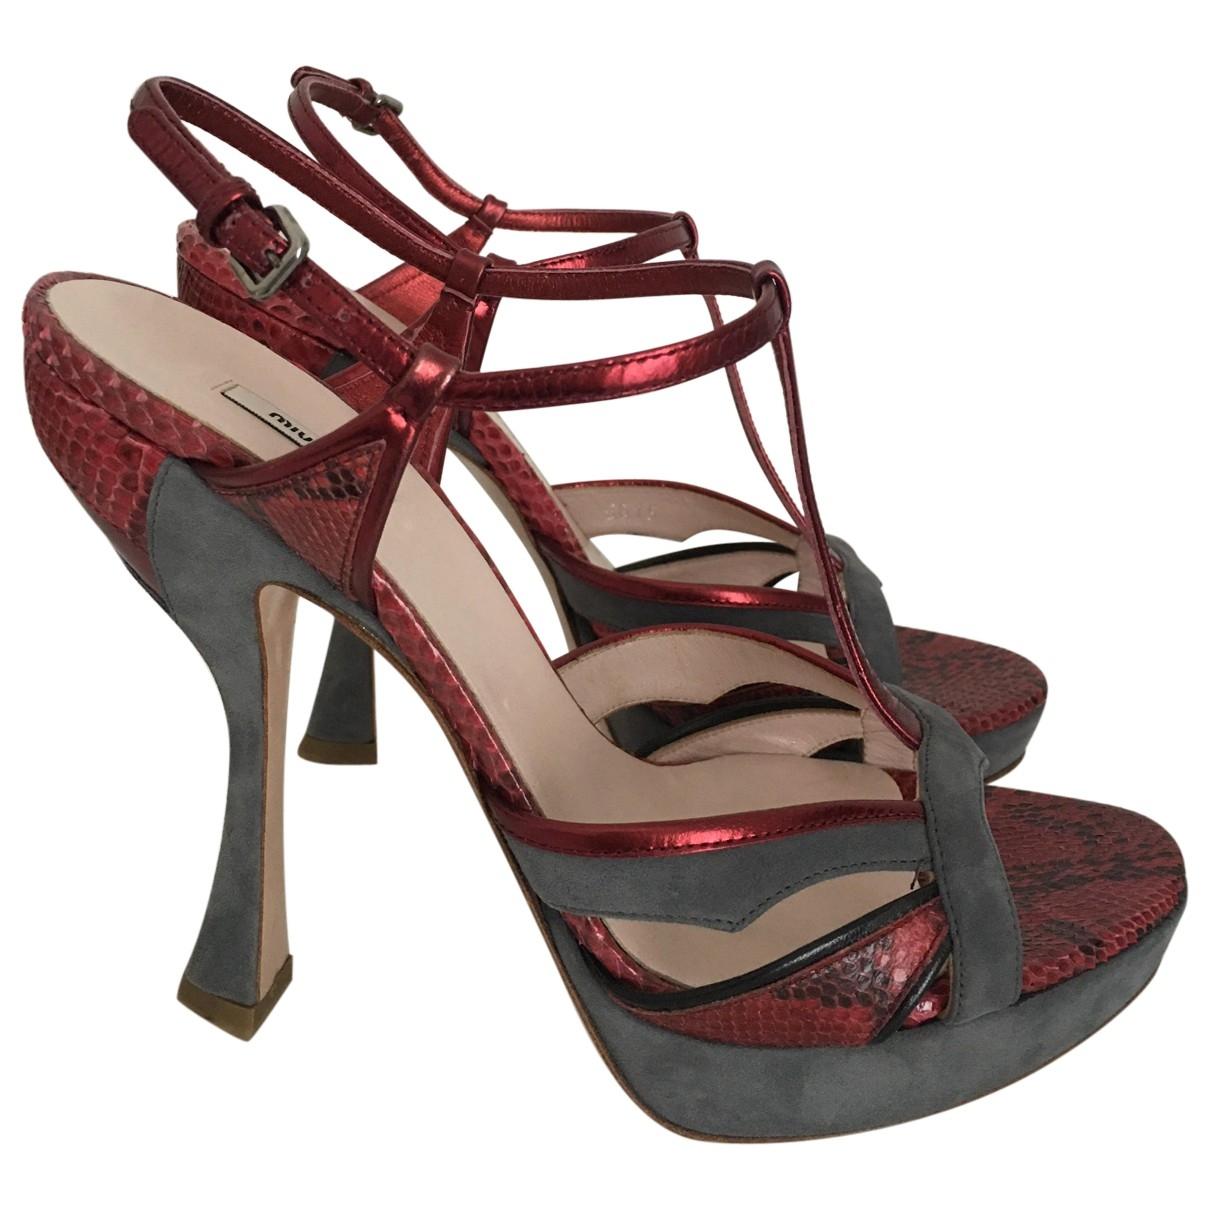 Miu Miu \N Burgundy Python Sandals for Women 38 EU